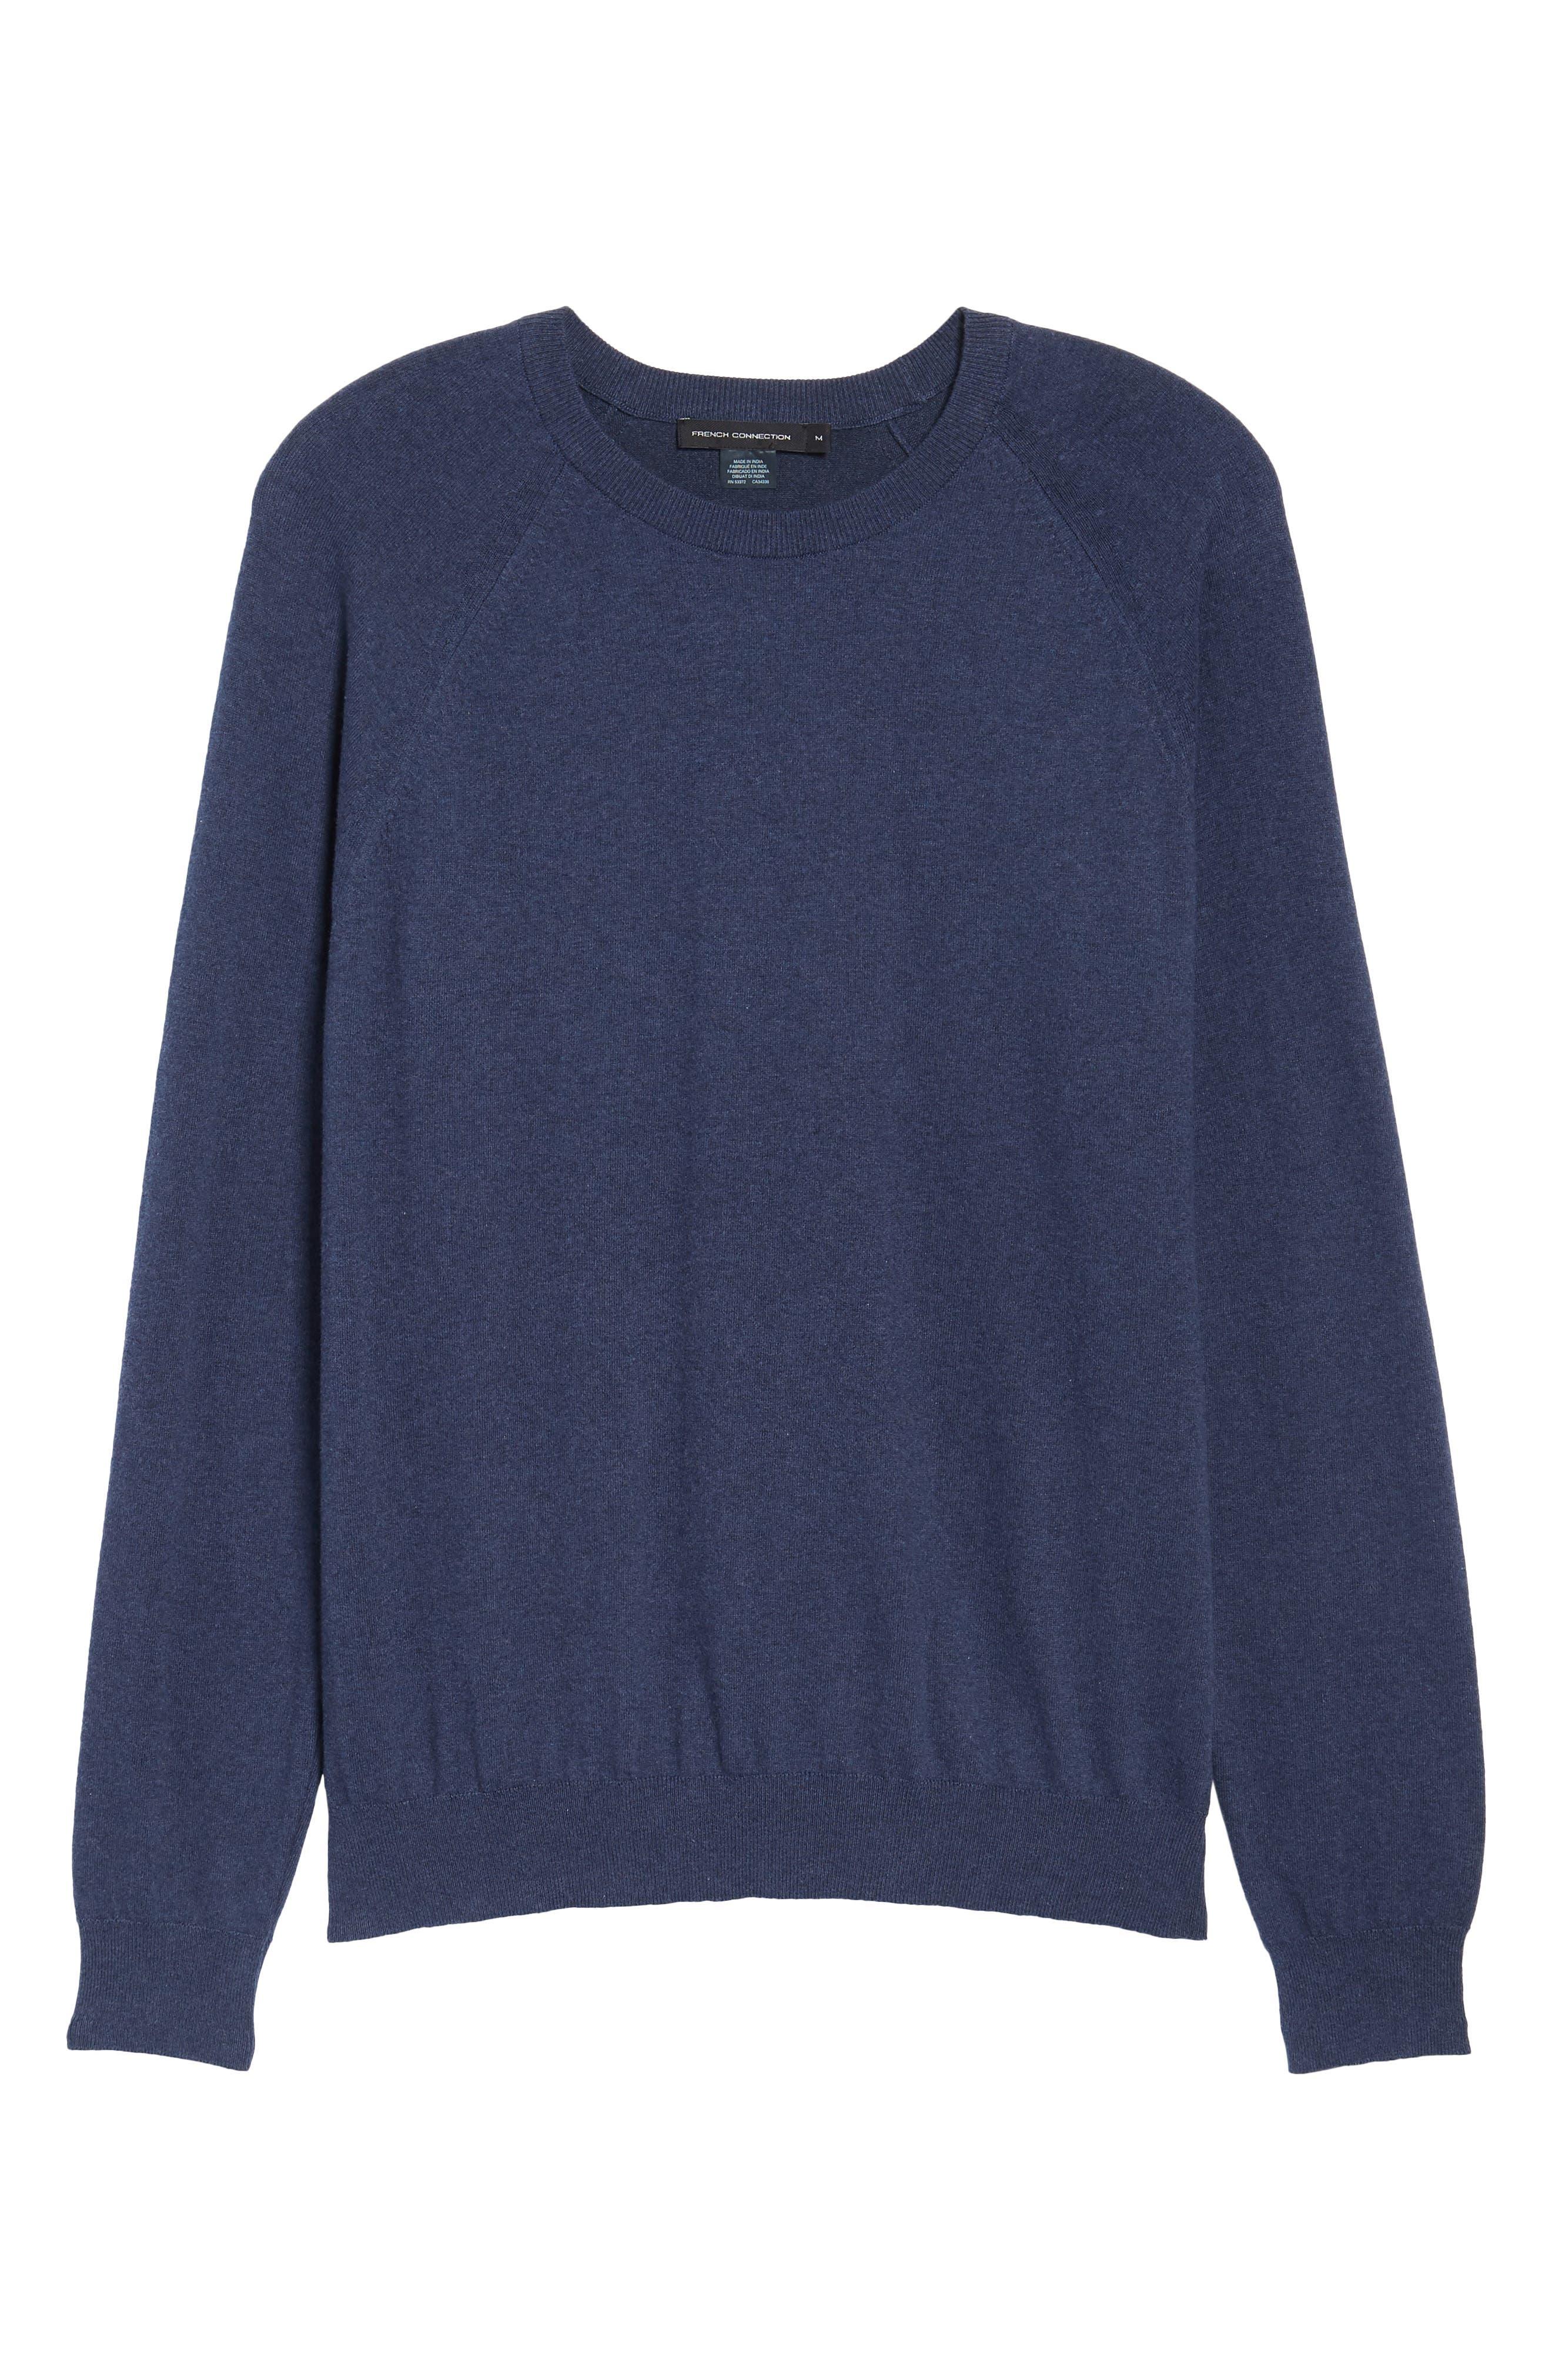 Regular Fit Stretch Cotton Sweater,                             Alternate thumbnail 6, color,                             INDIGO MELANGE